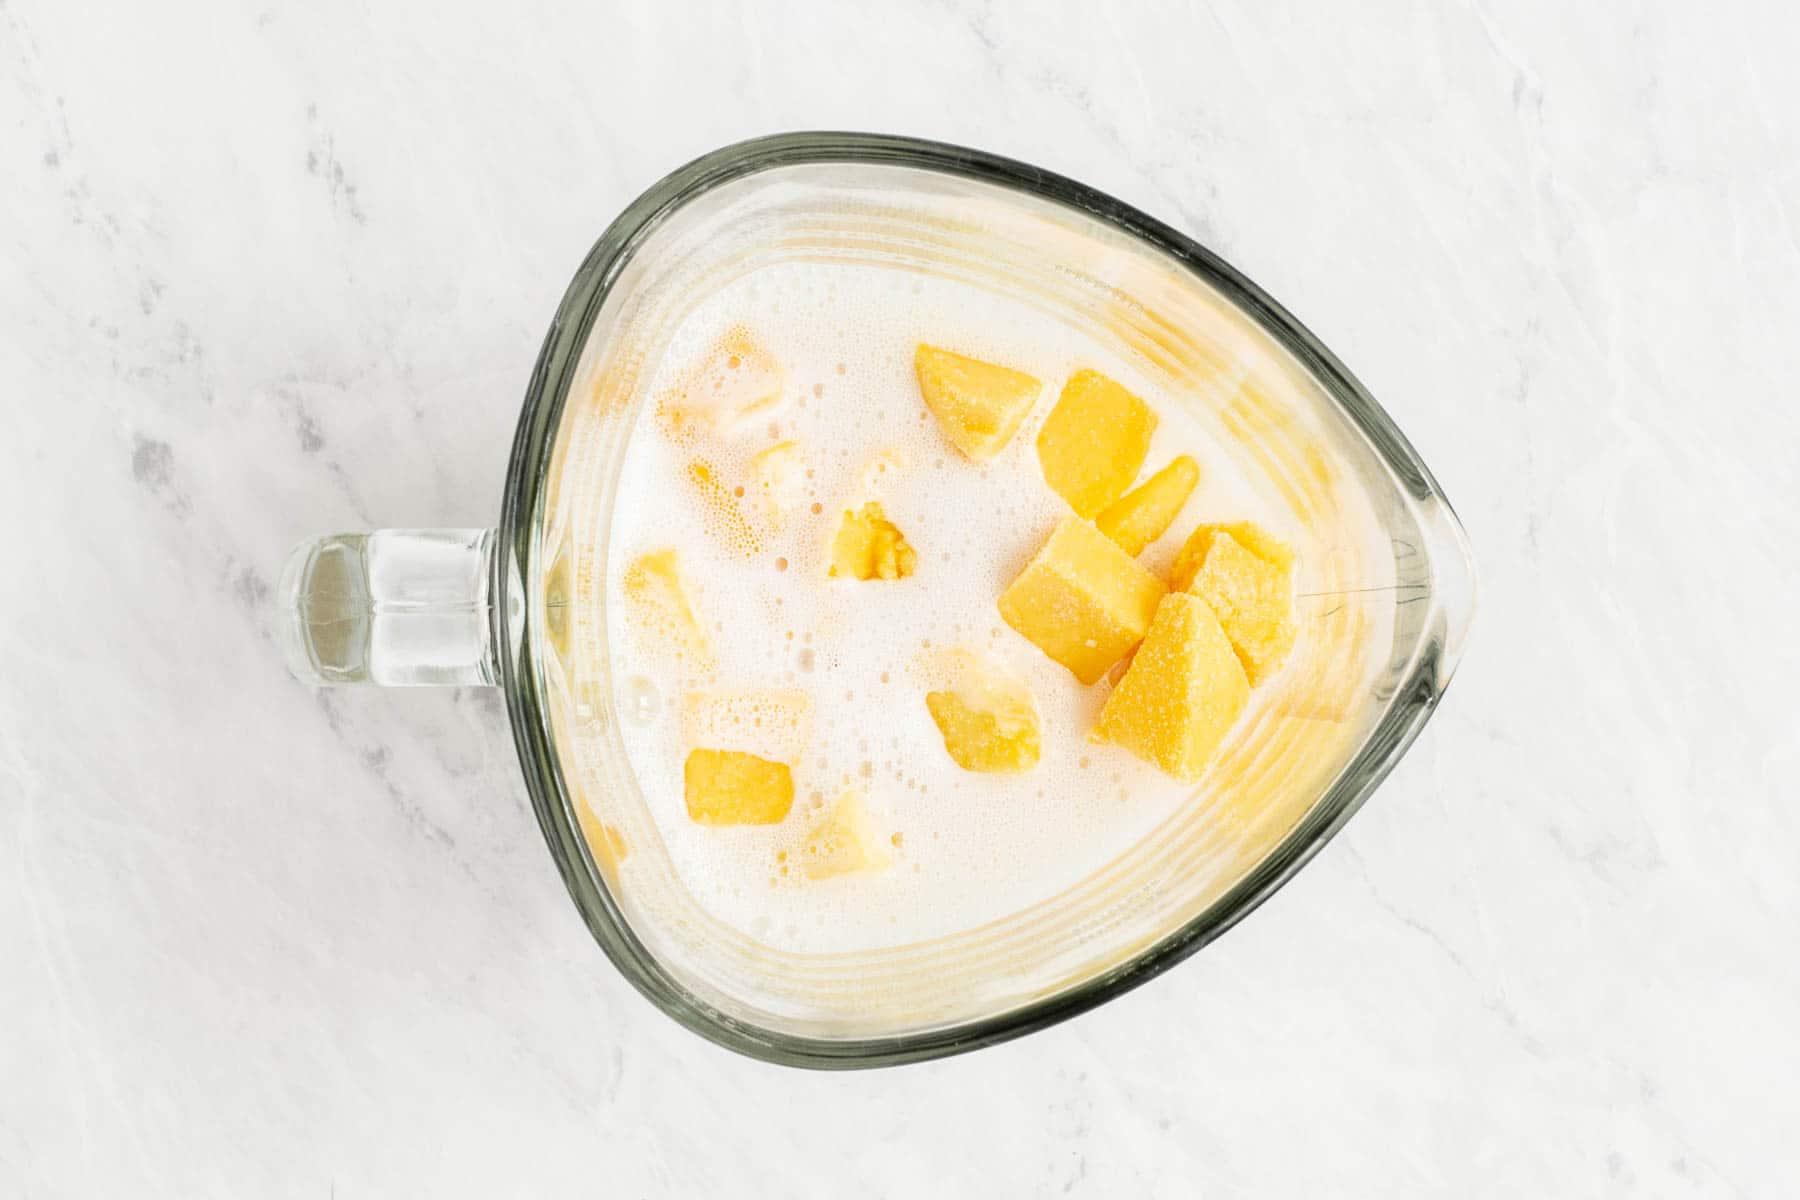 Mango chunks in blender with white liquid.